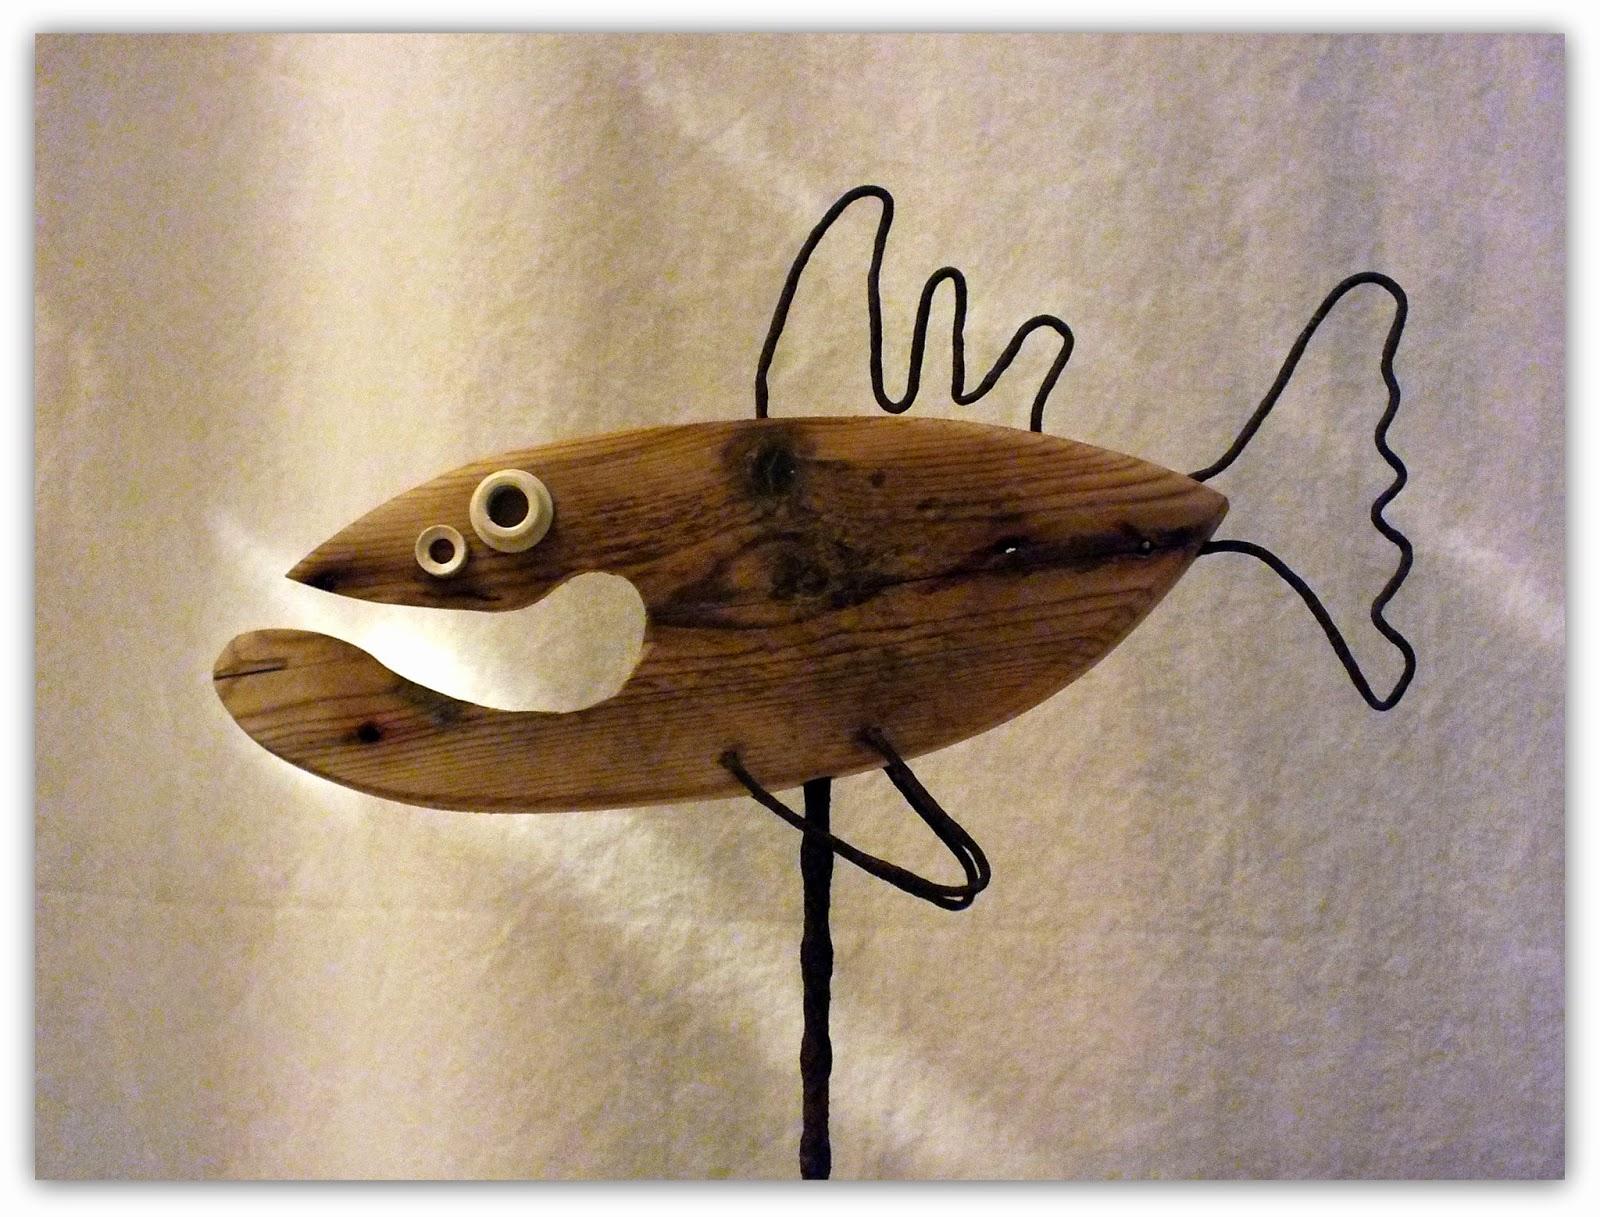 o'fishl, poisson en bois flotté et métal, réversible ! | mutoz inc